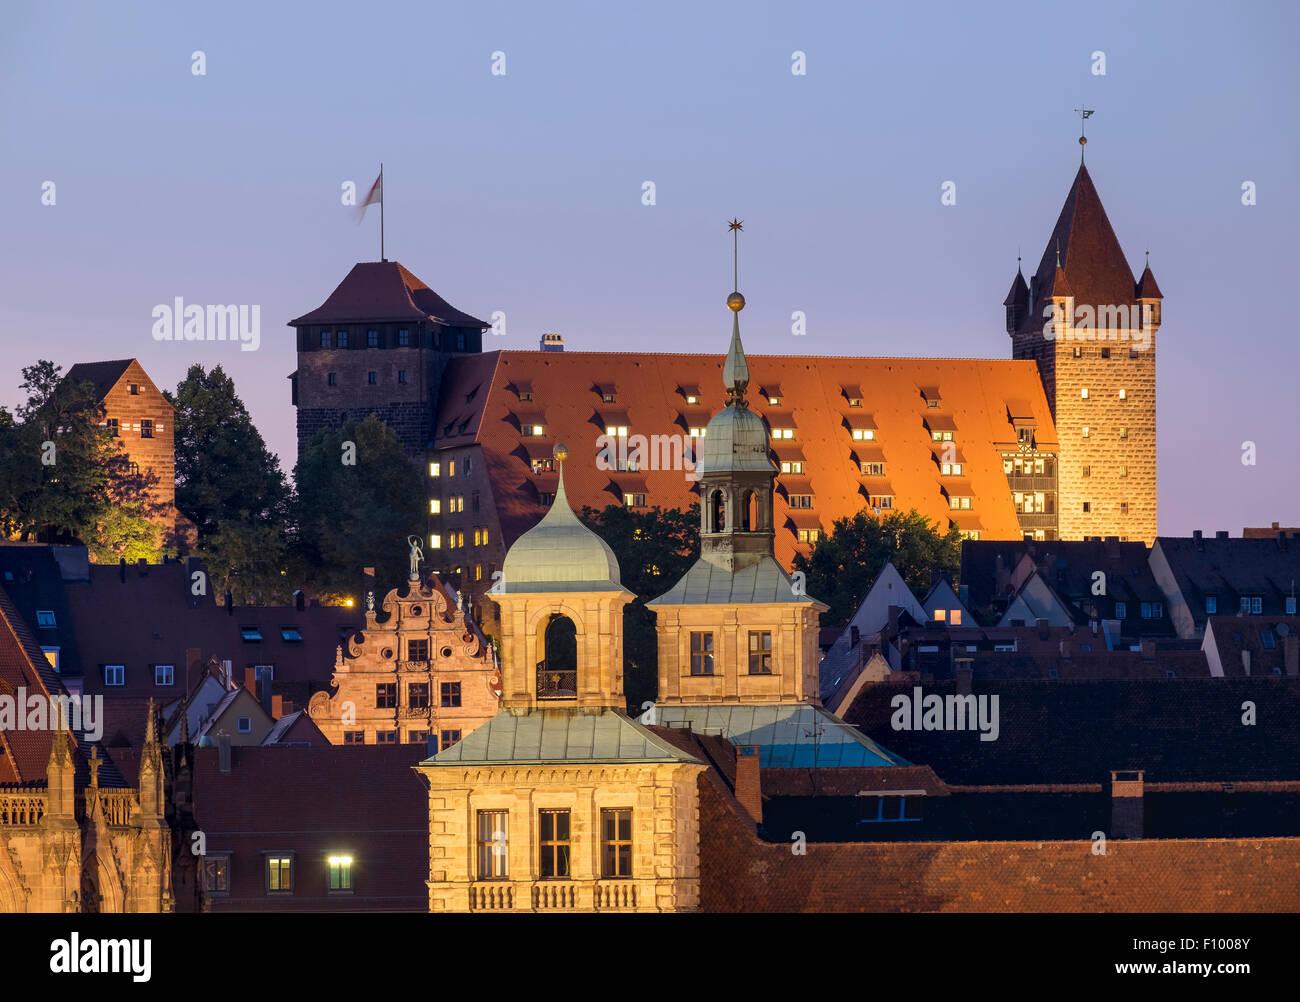 City Hall, Fembohaus, Castle stables, historic centre of Sebald, Nuremberg, Middle Franconia, Franconia, Bavaria, - Stock Image